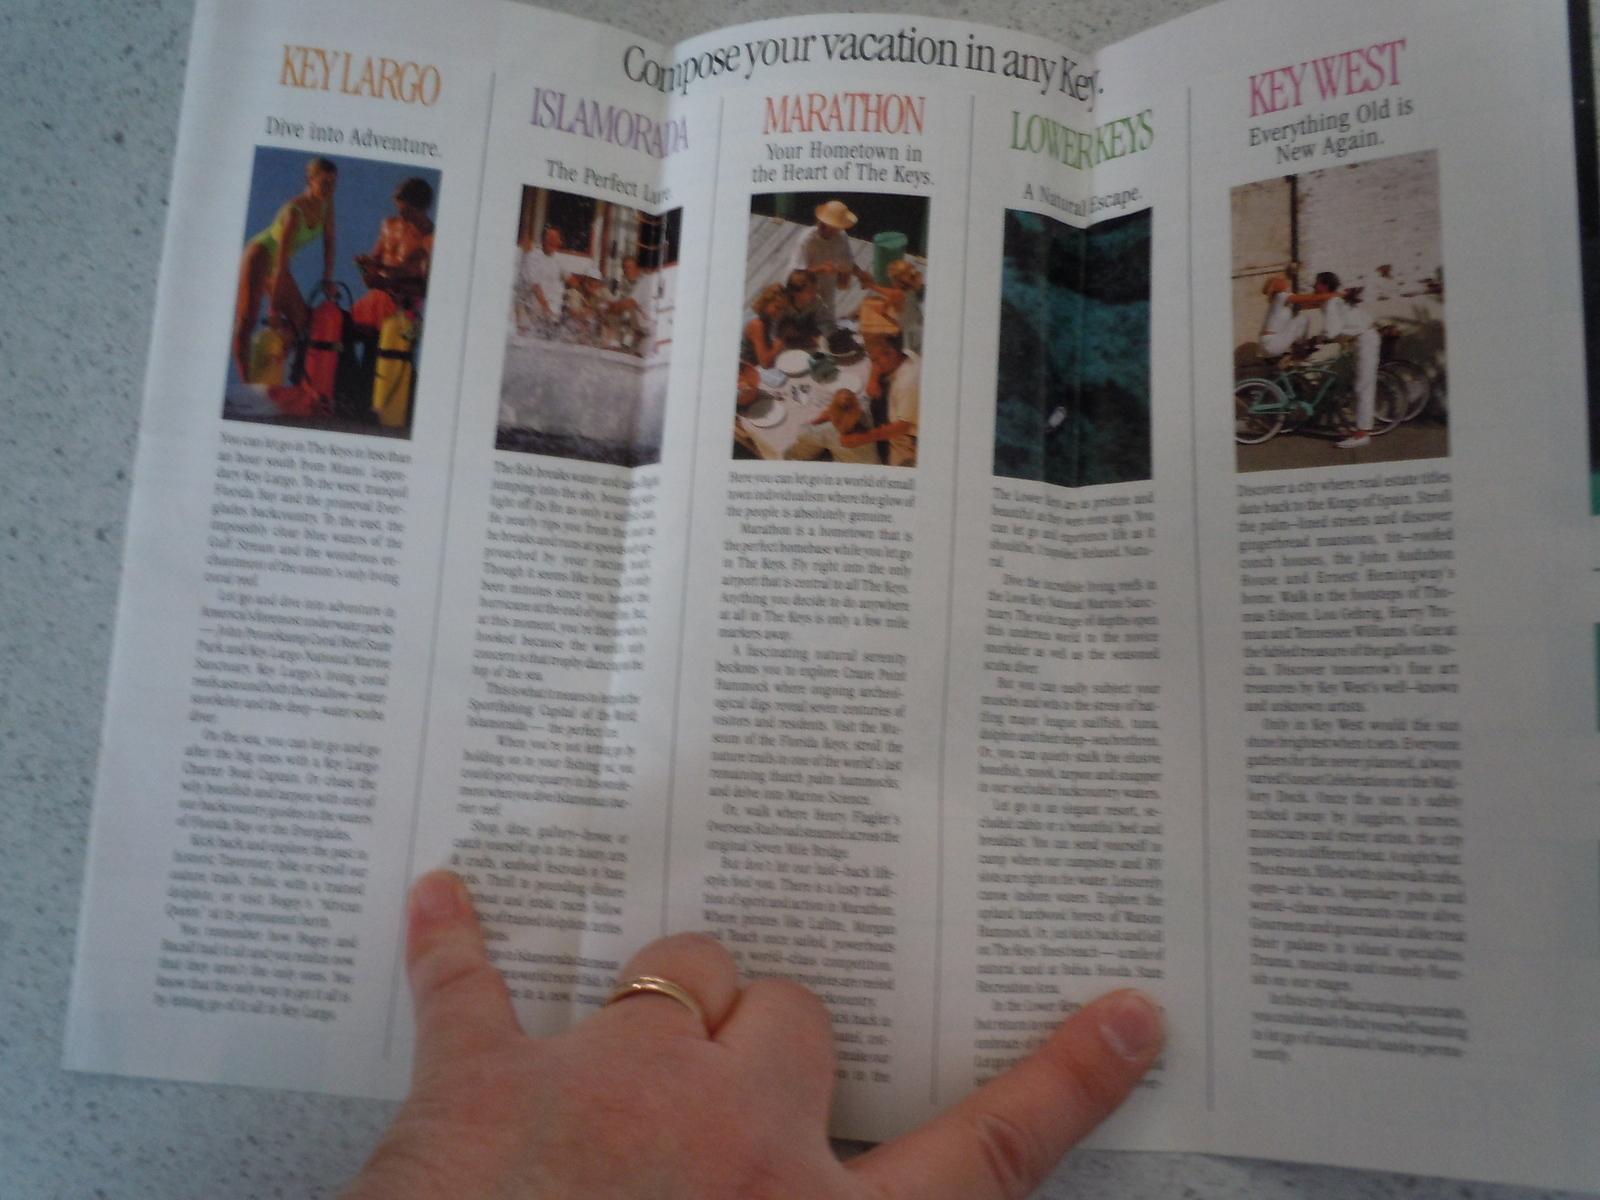 The Florida Keys and Key West Brochure 1990